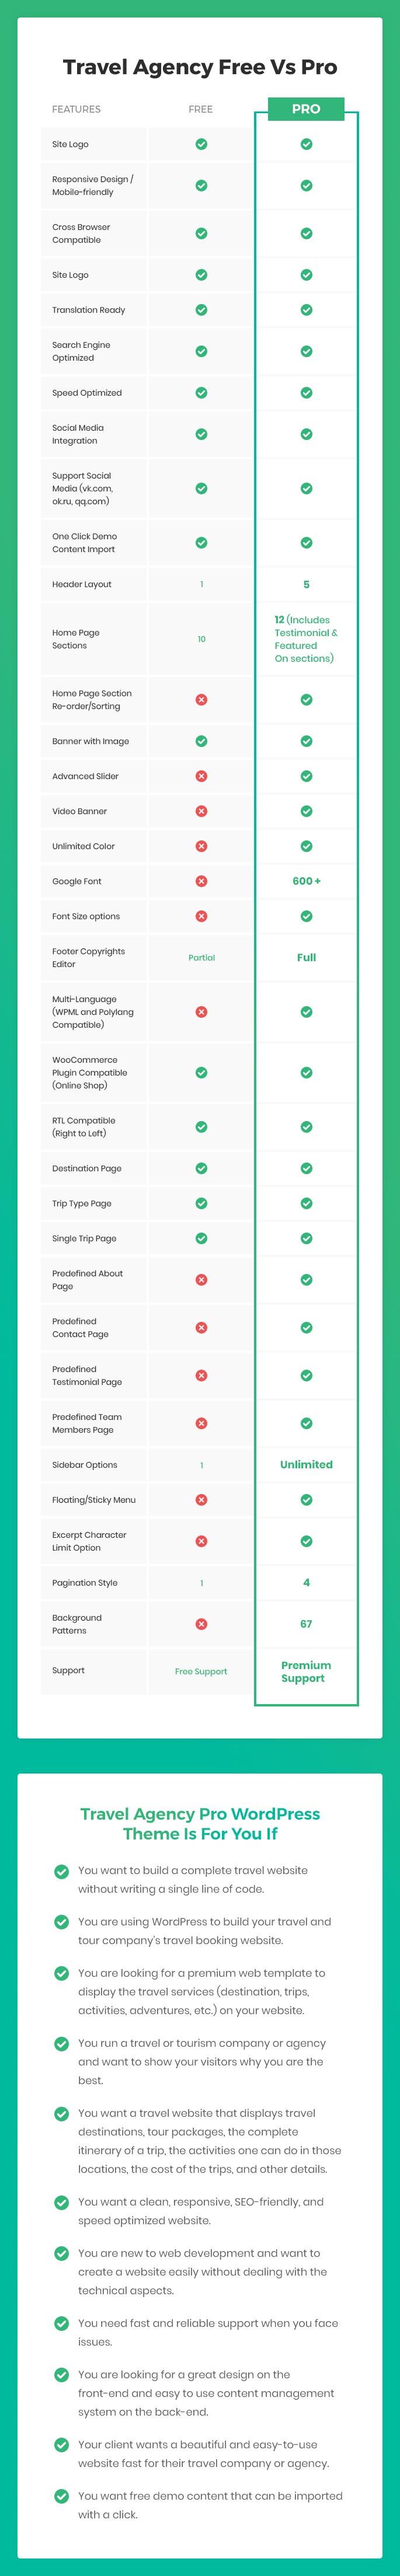 Travel Agency Free Vs Pro theme comparison chart